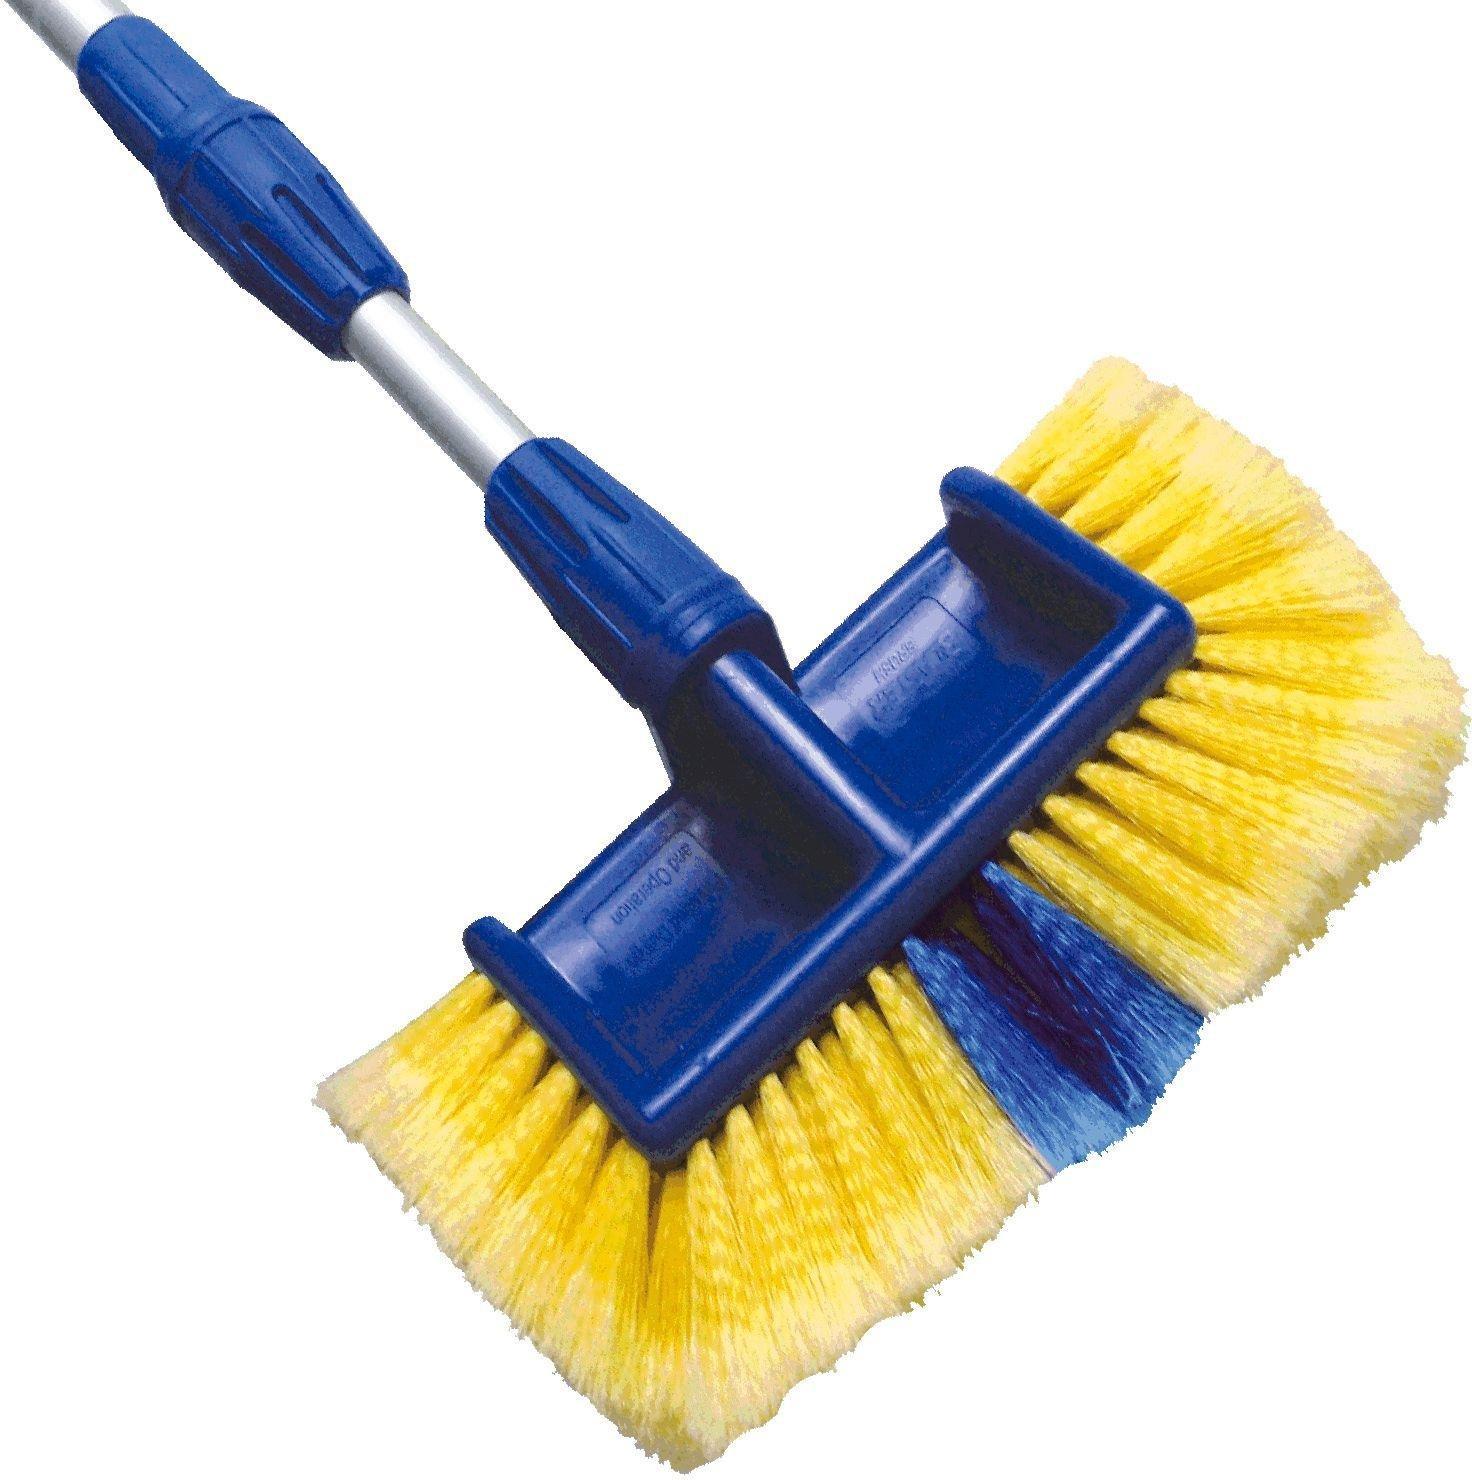 High Pressure Broom : Streetwize blaster brush and broom kit